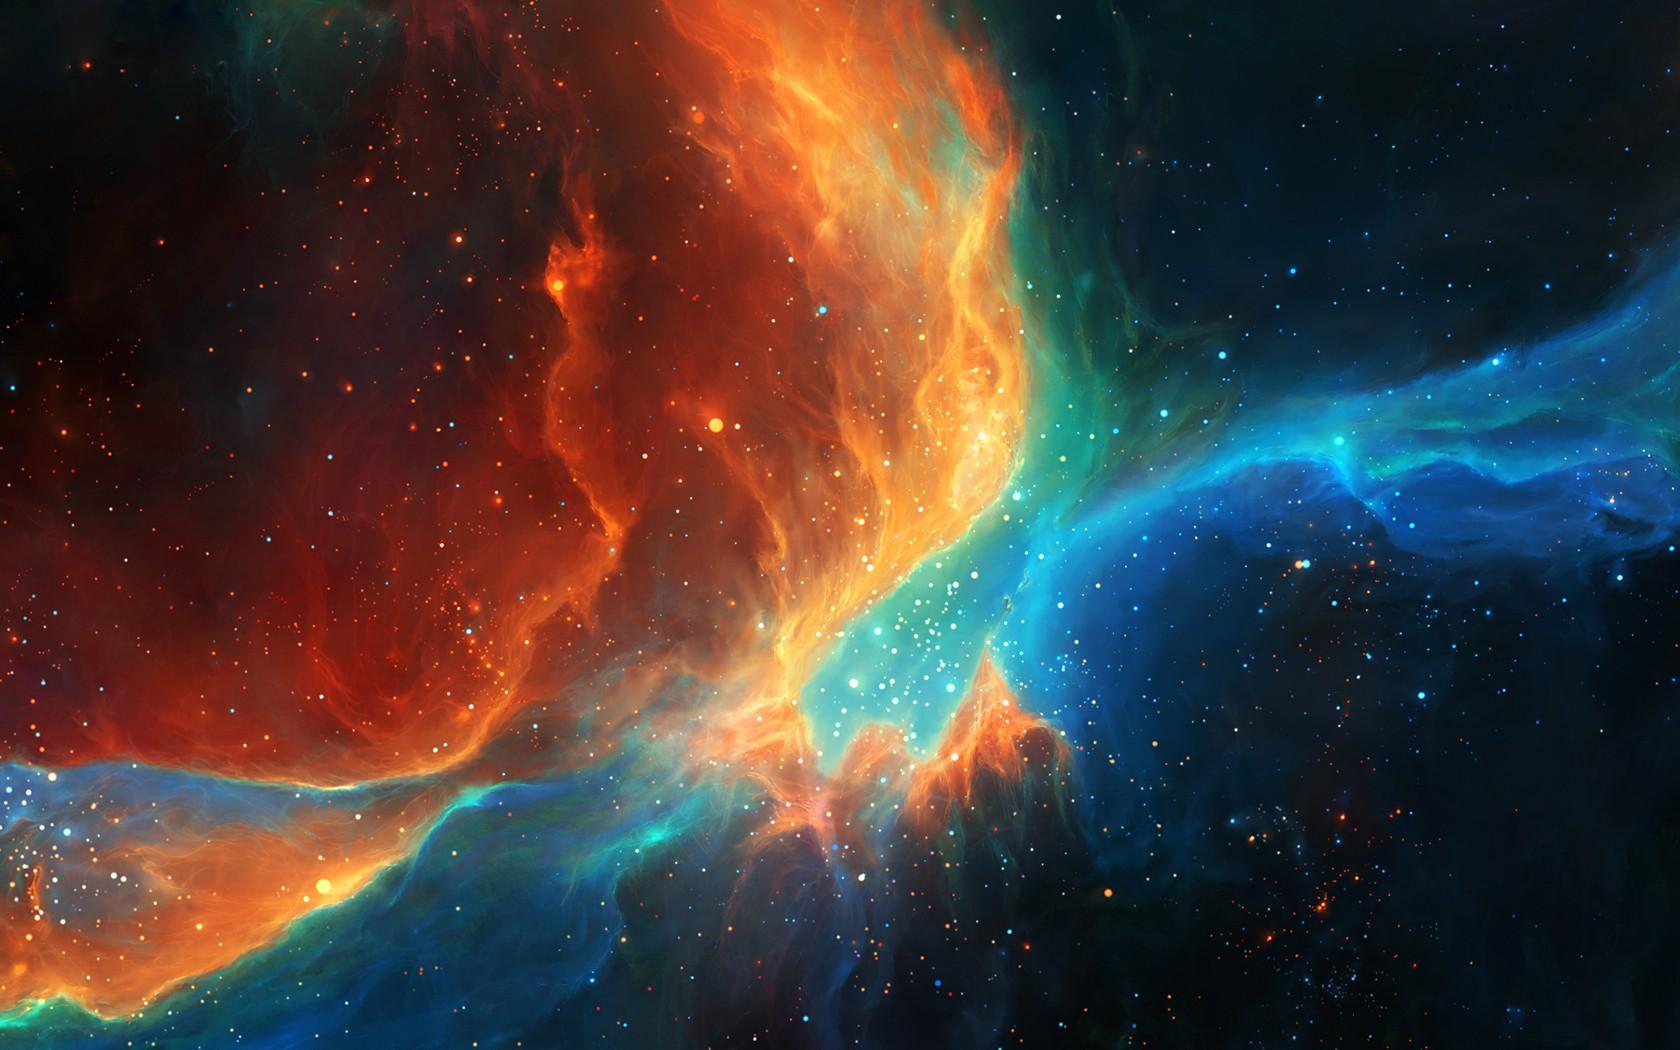 Unduh 64+ Gambar Galaxy Warna Warni Hd Paling Bagus Gratis